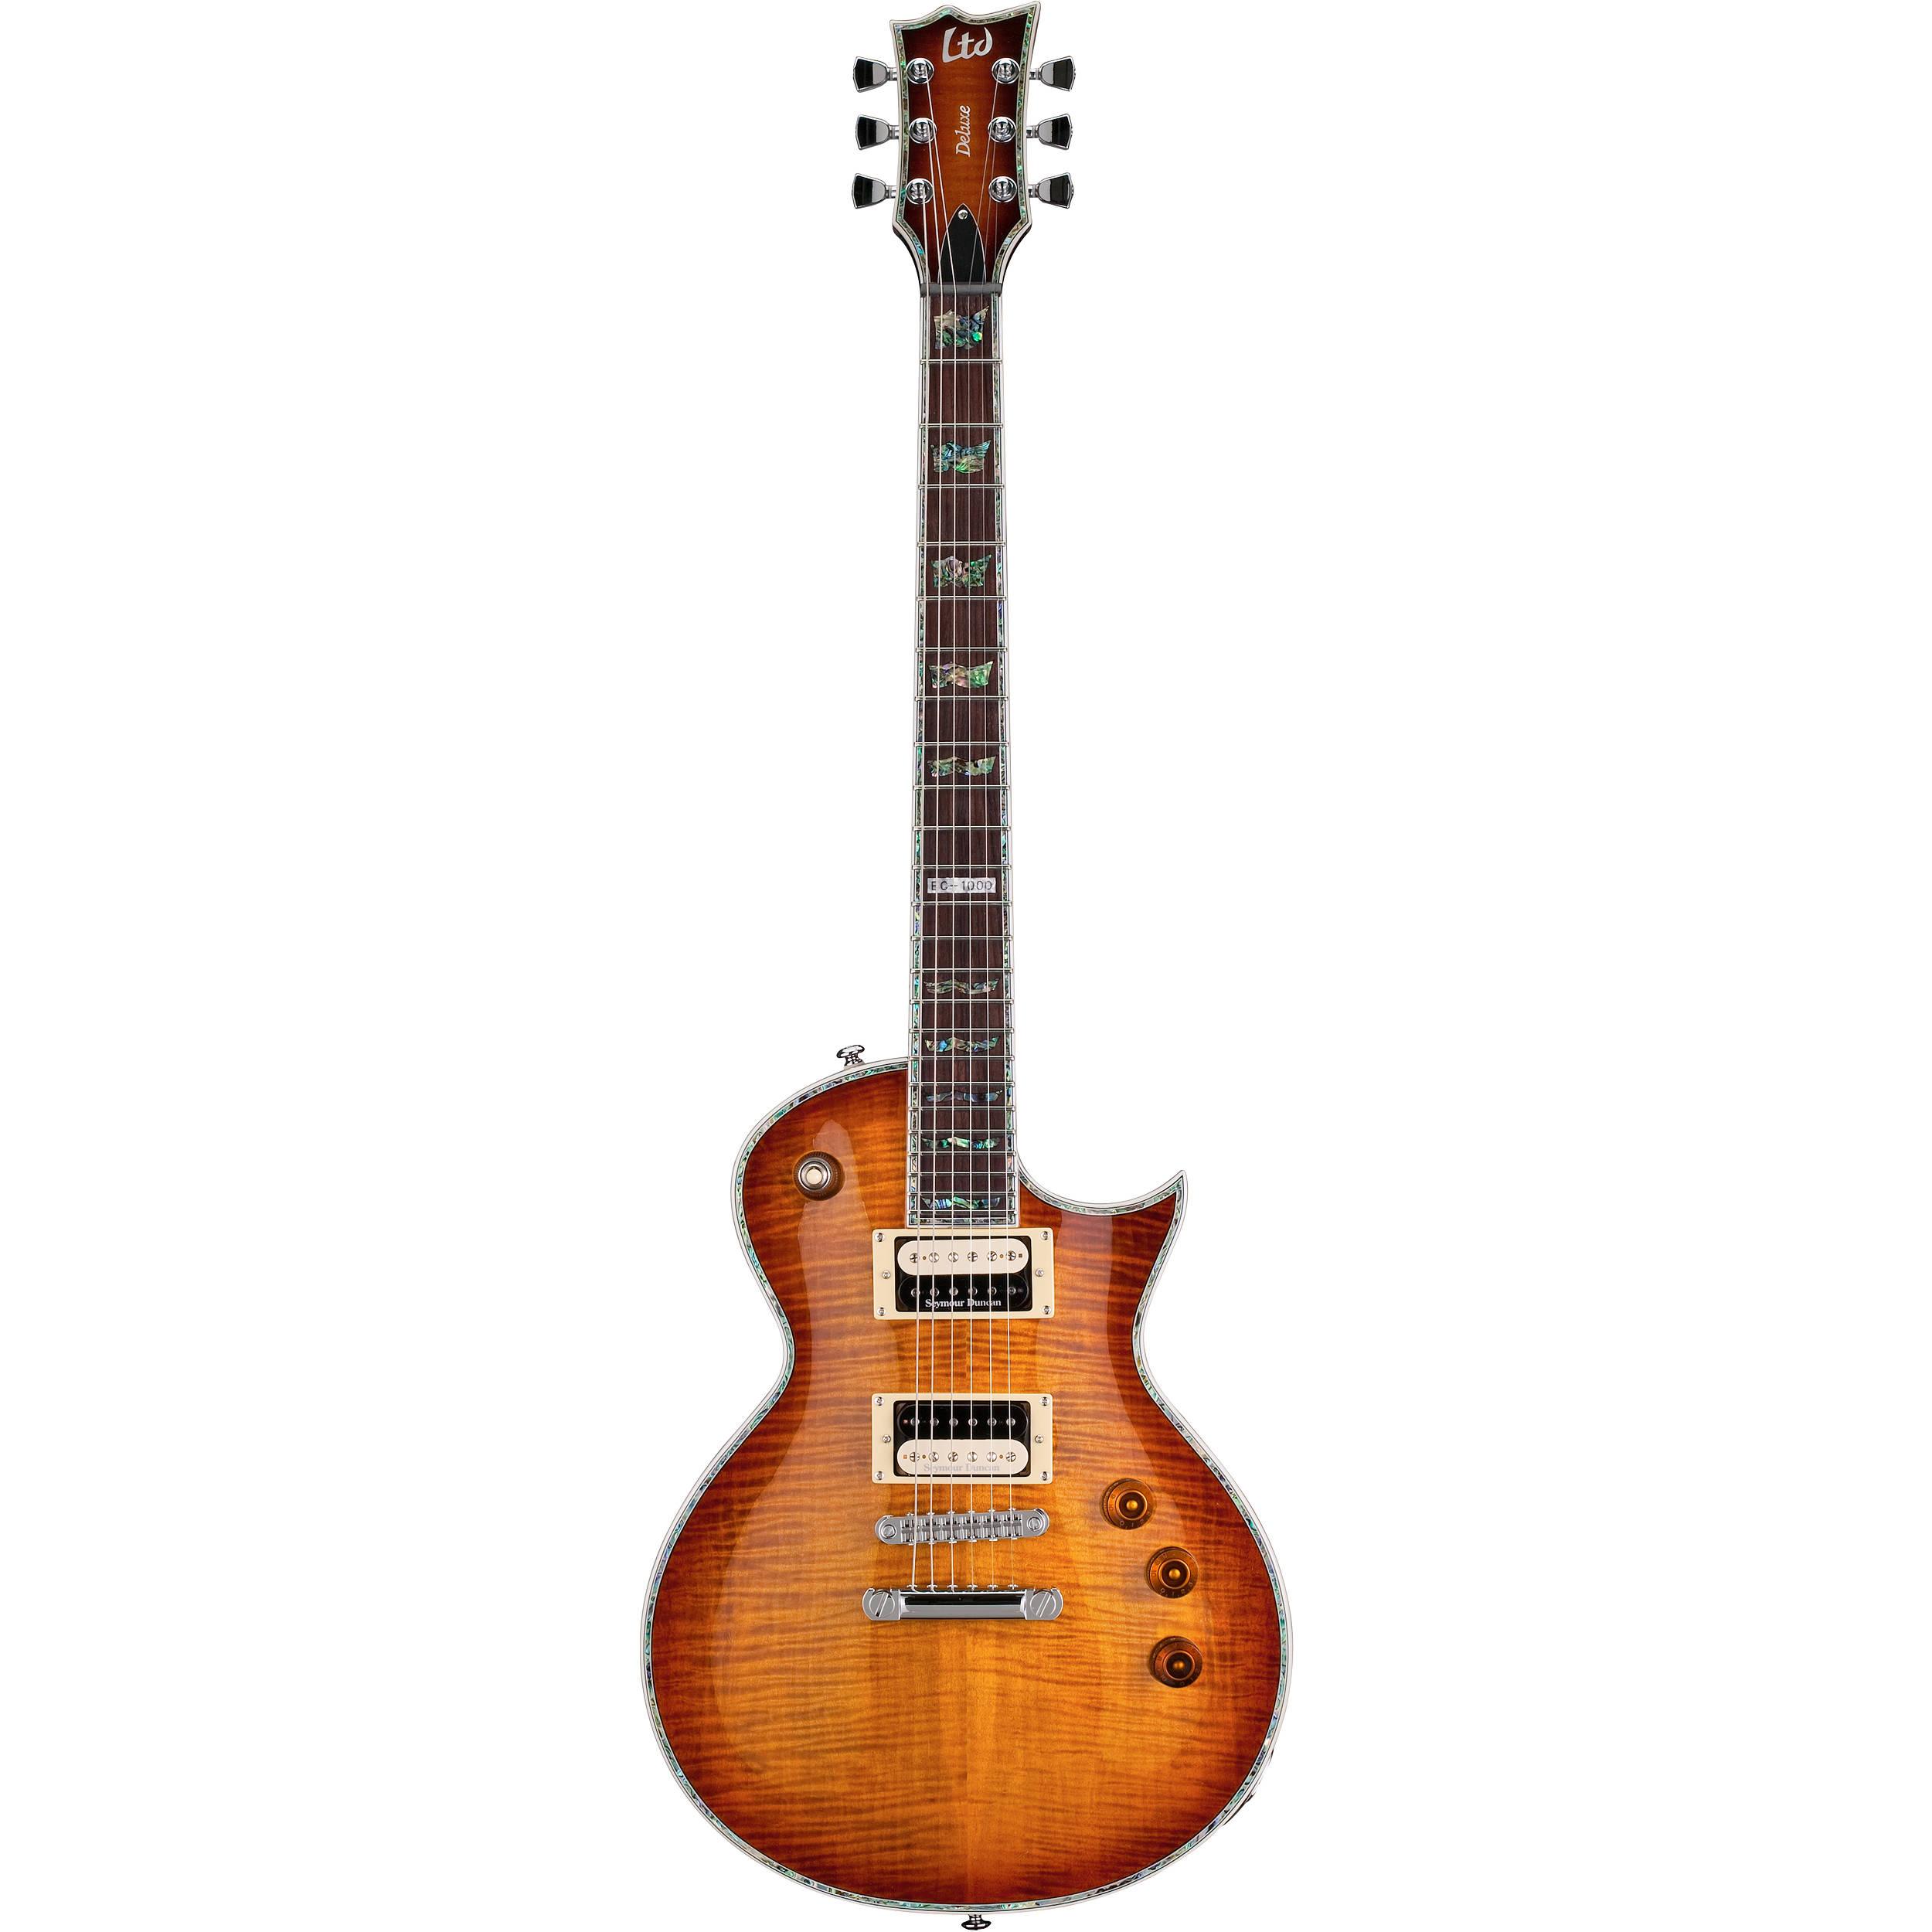 esp ltd ec 1000fm electric guitar amber sunburst lec1000asb. Black Bedroom Furniture Sets. Home Design Ideas